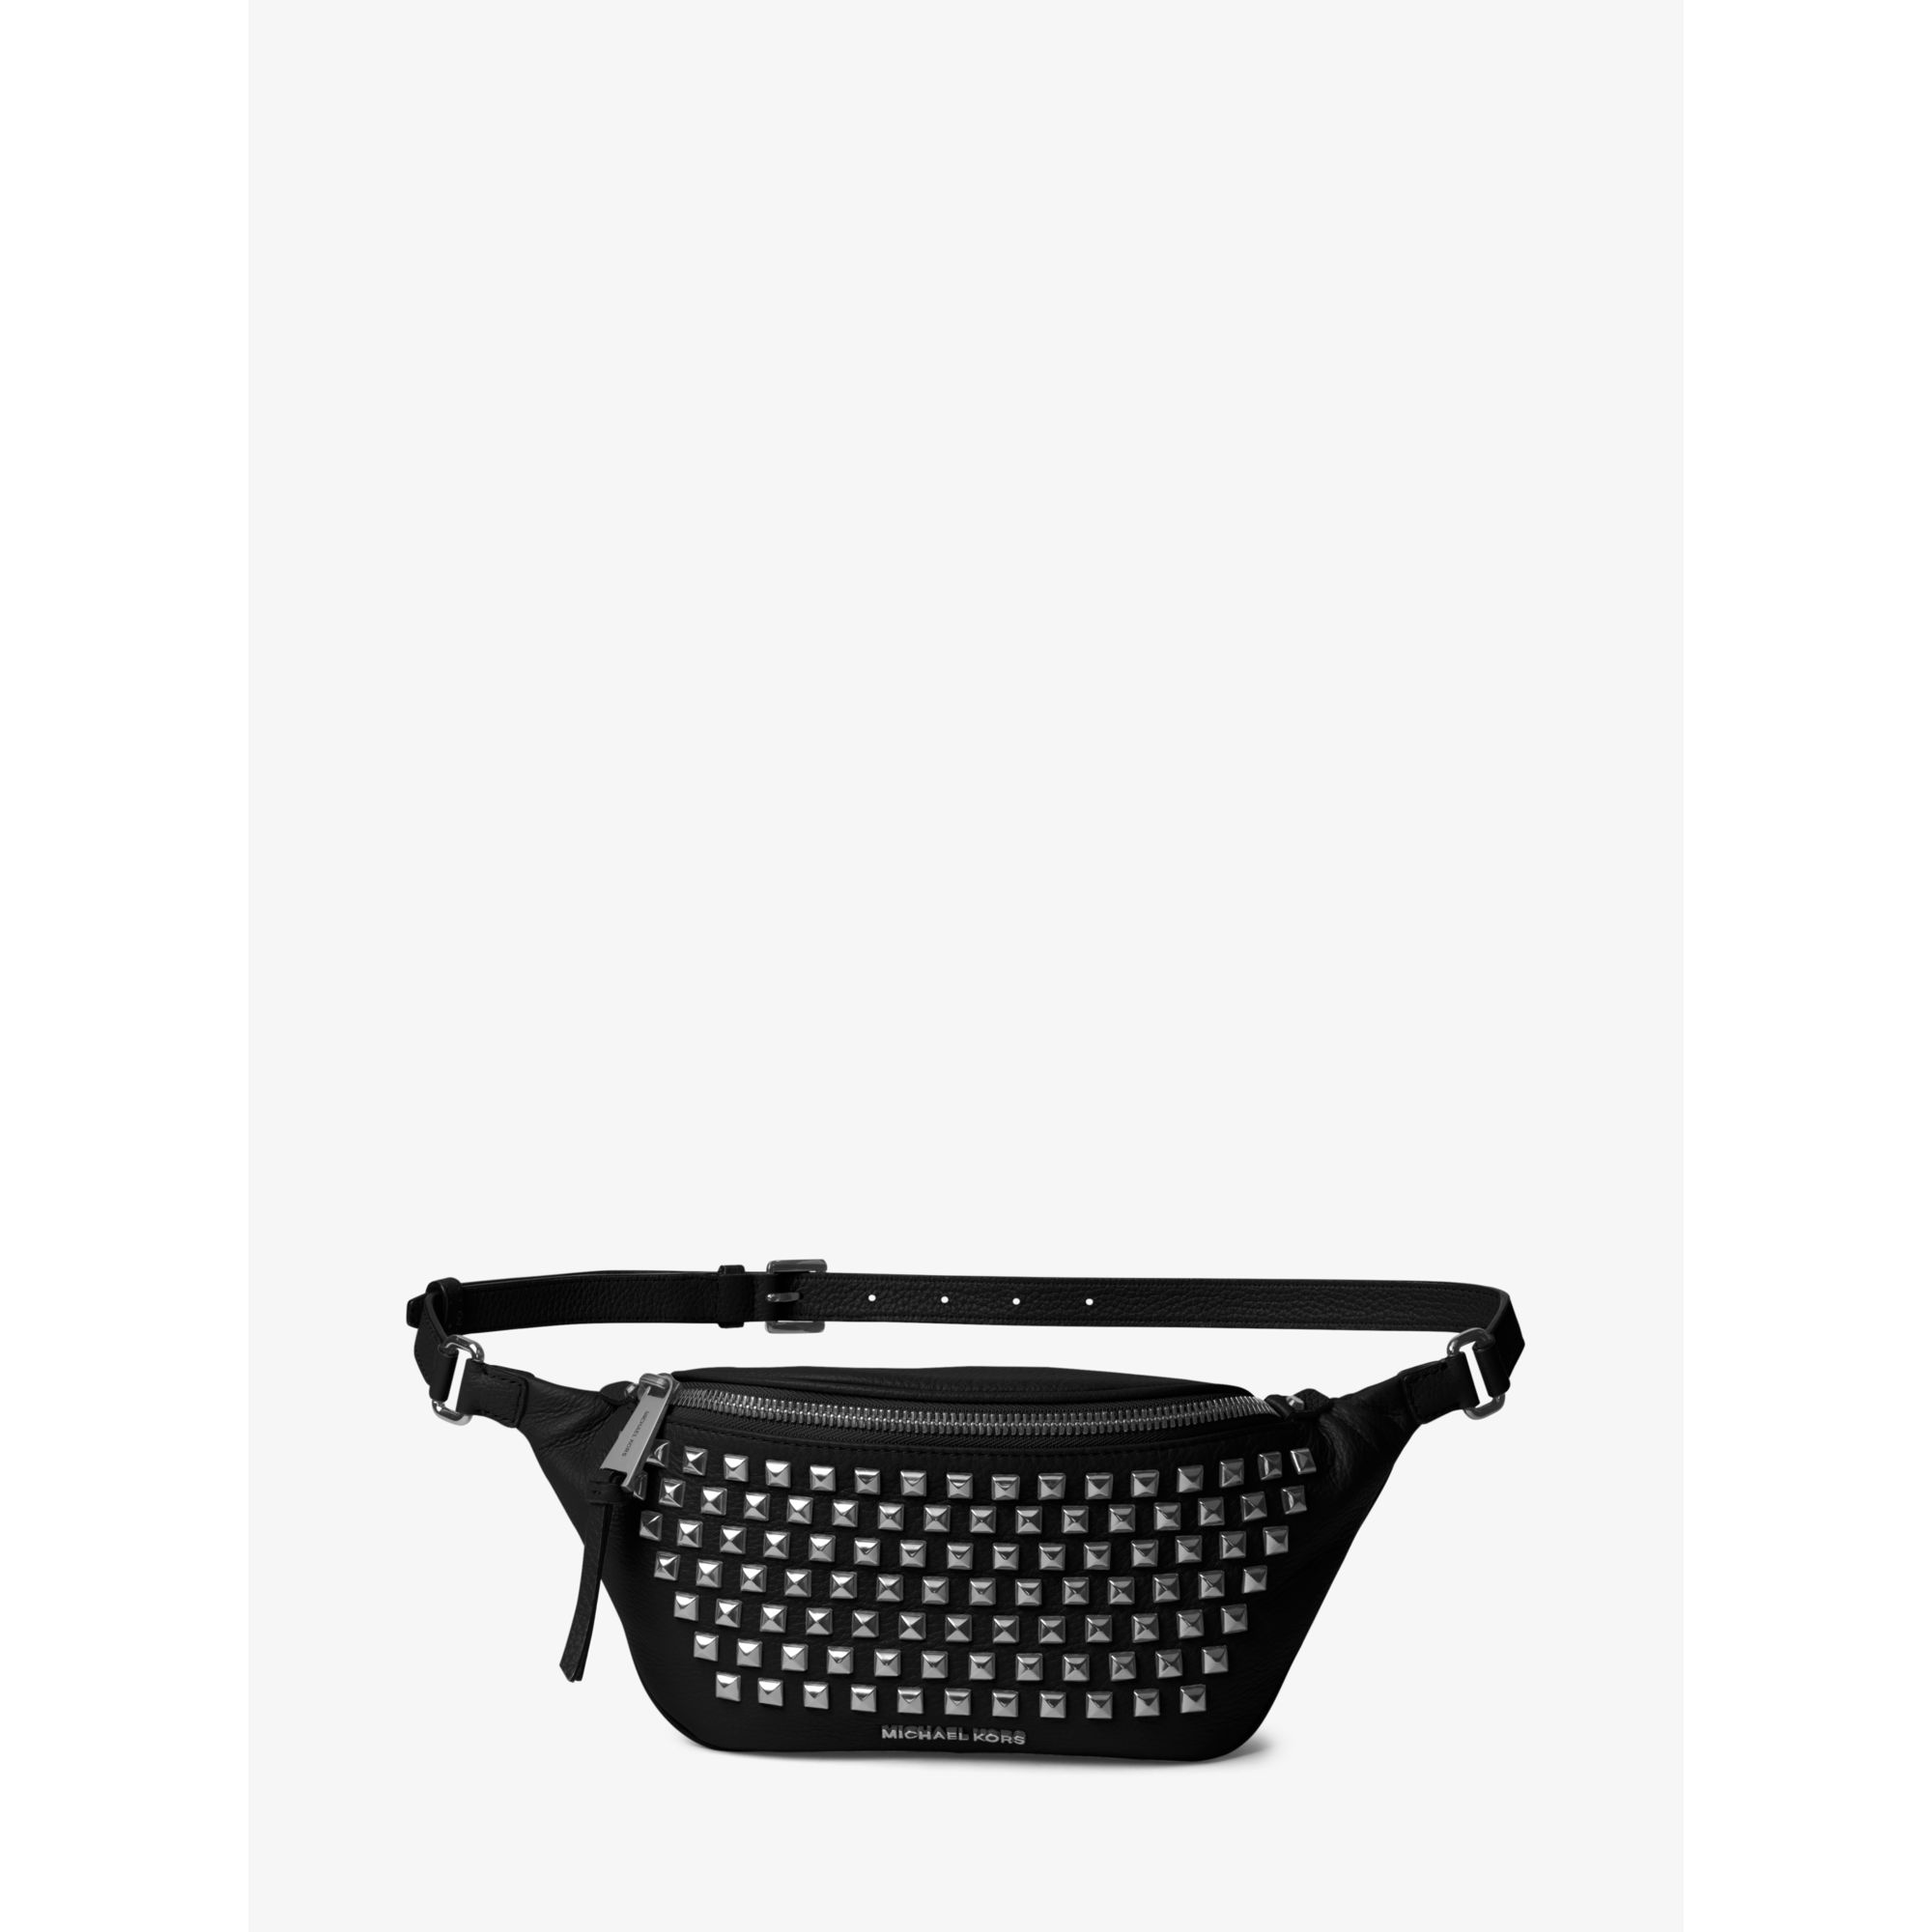 ffe301b16ee3a0 Michael Kors Rhea Leather Pyramid Studded Belt Bag in Black - Lyst